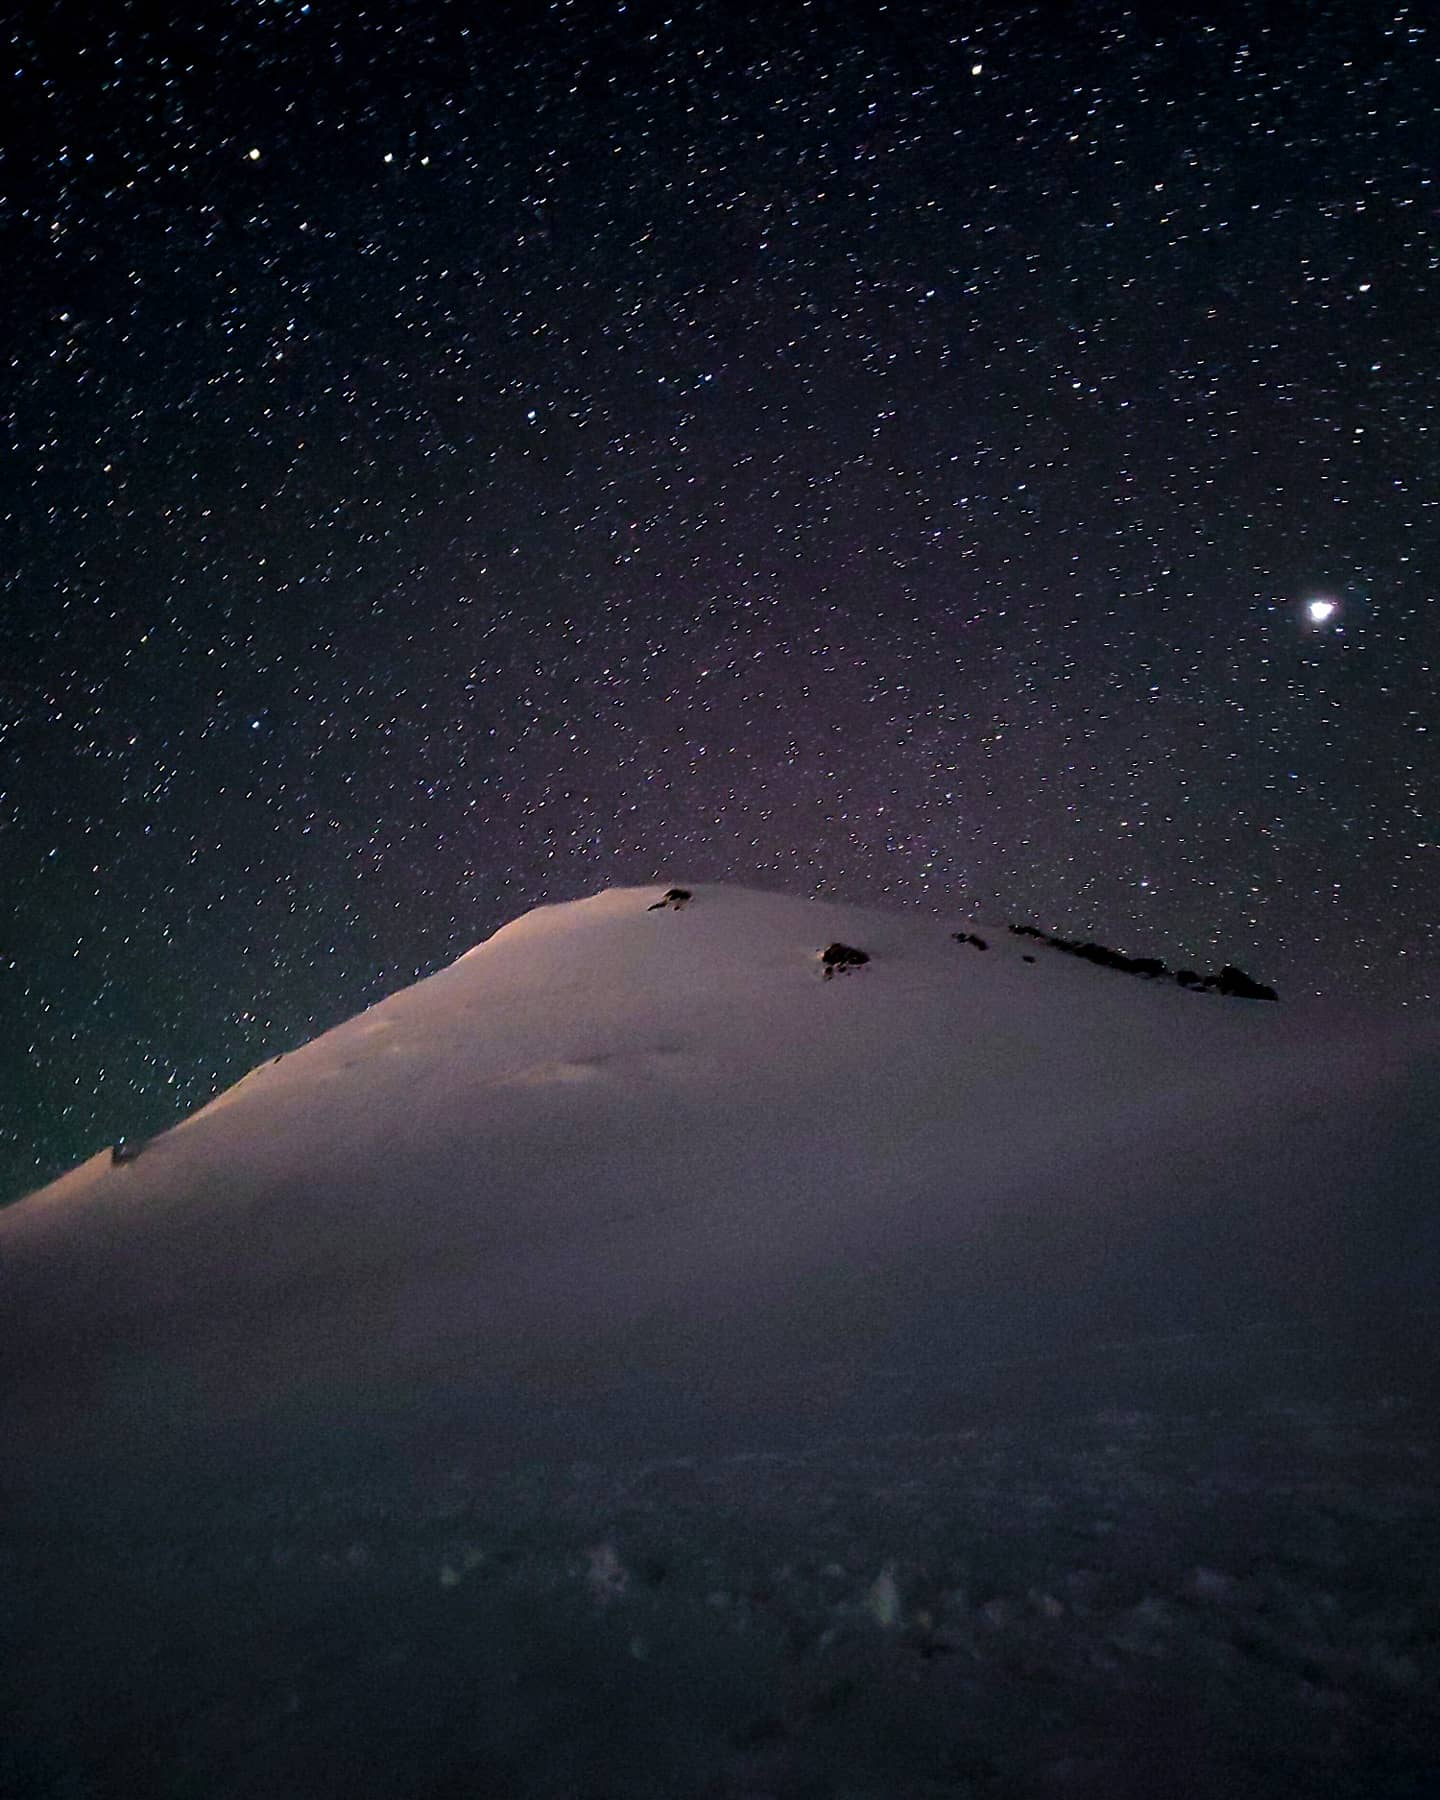 Kazbek milkyway highcamp mountaineering stars star Caucasus